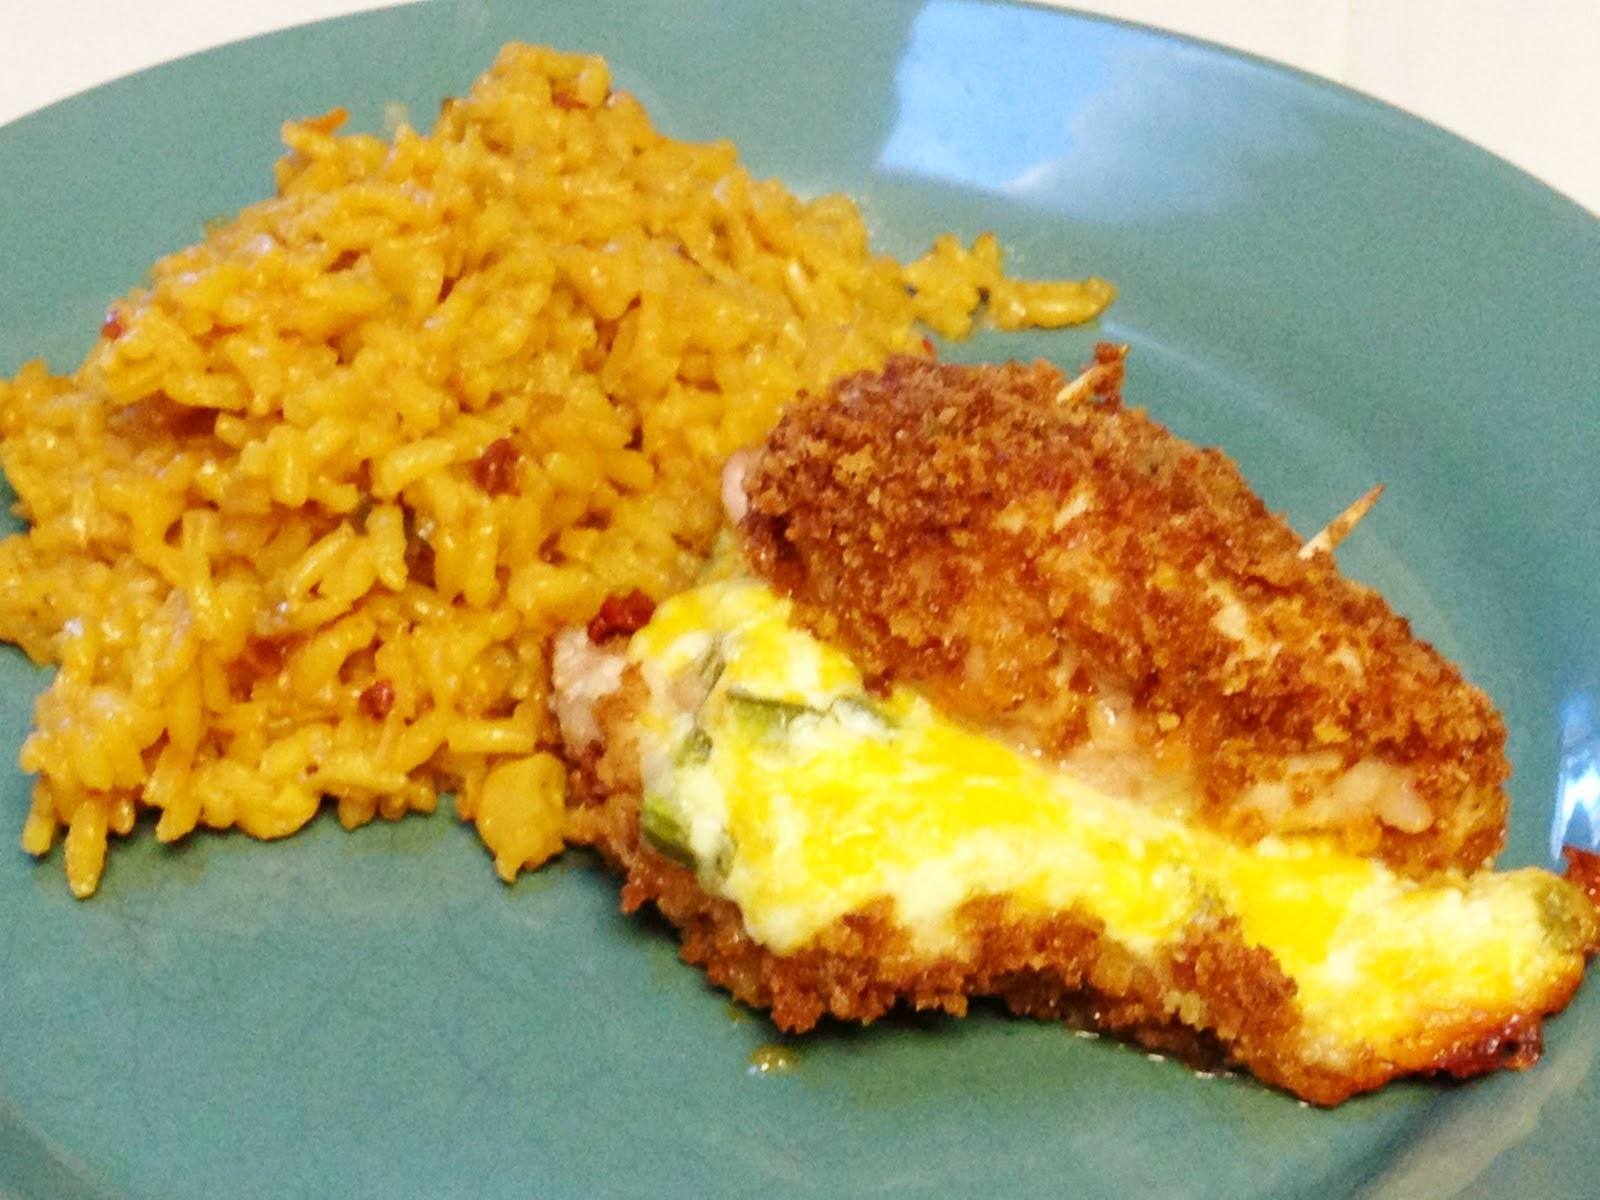 Cheesy Jalapeno Popper Baked Stuffed Chicken Recipe — Dishmaps